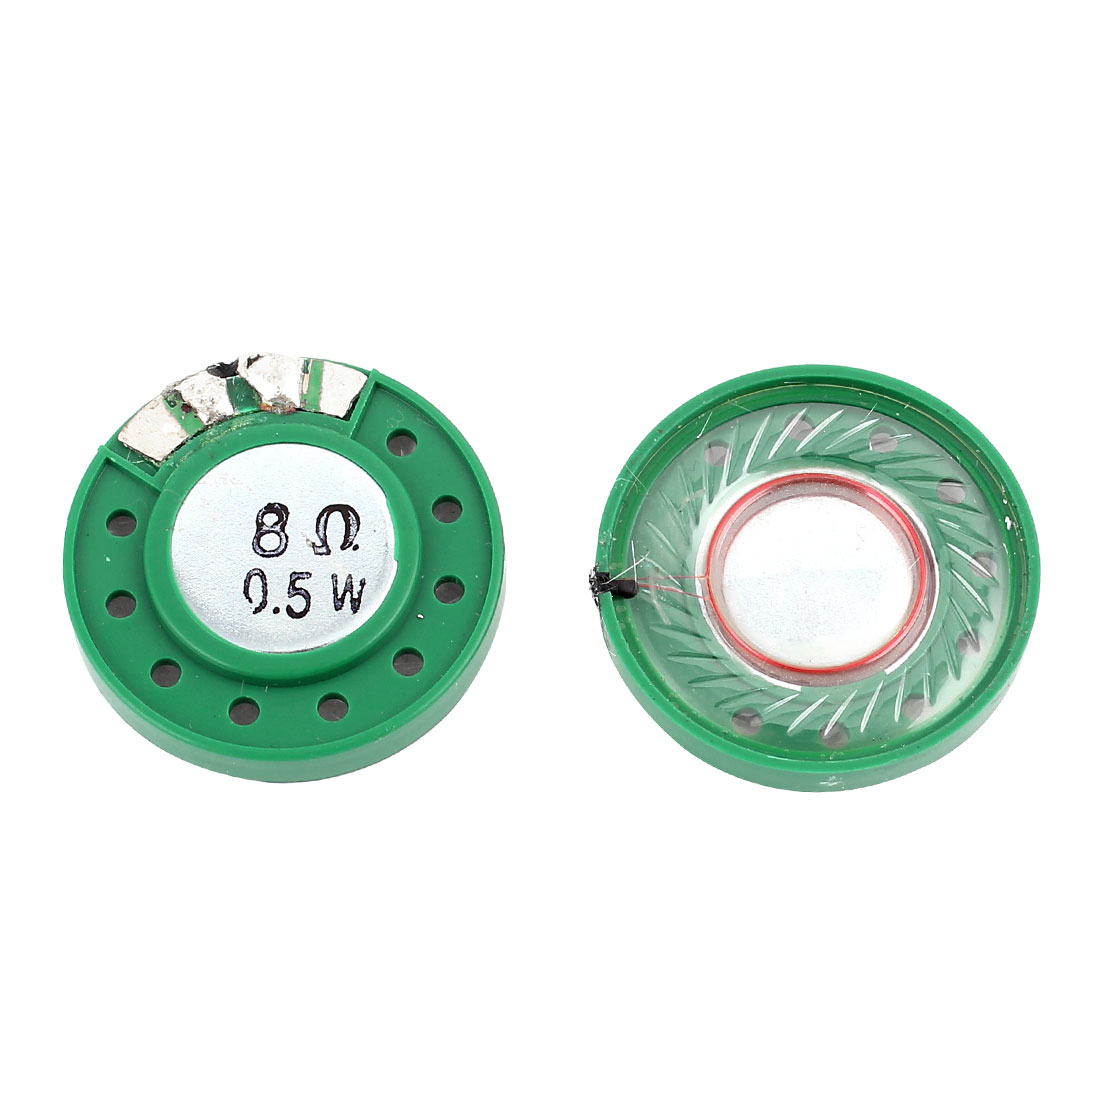 2pcs 0.5W 8Ohm External Magnetic Magnet Electronic Speaker Loudspeaker 29mm